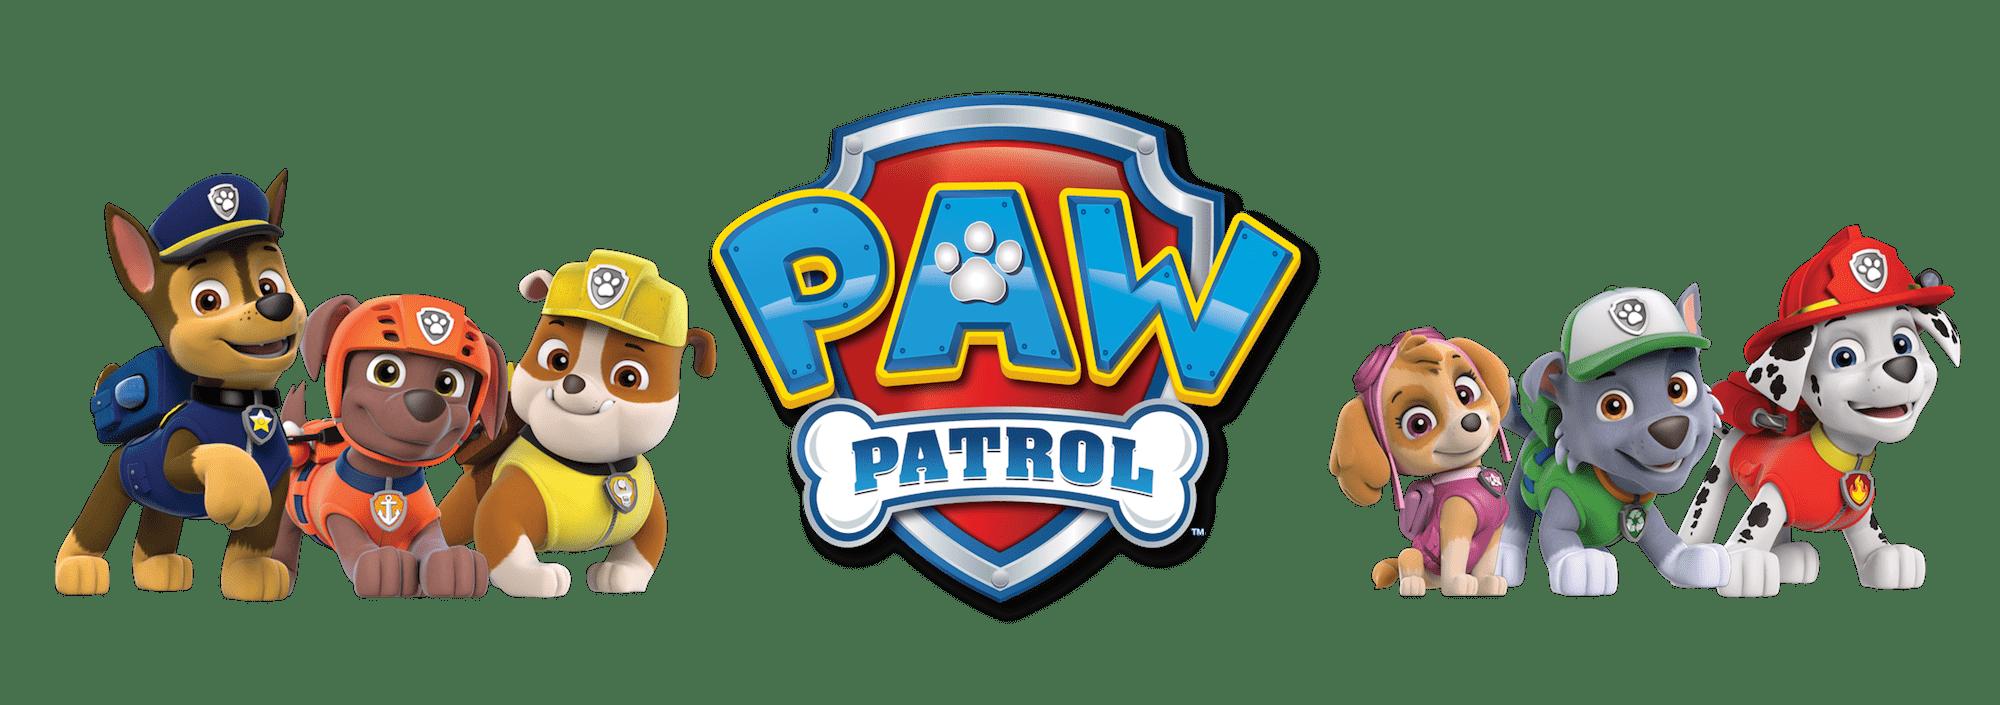 Pawpatrol logo paw patrol. Dogs clipart yoga